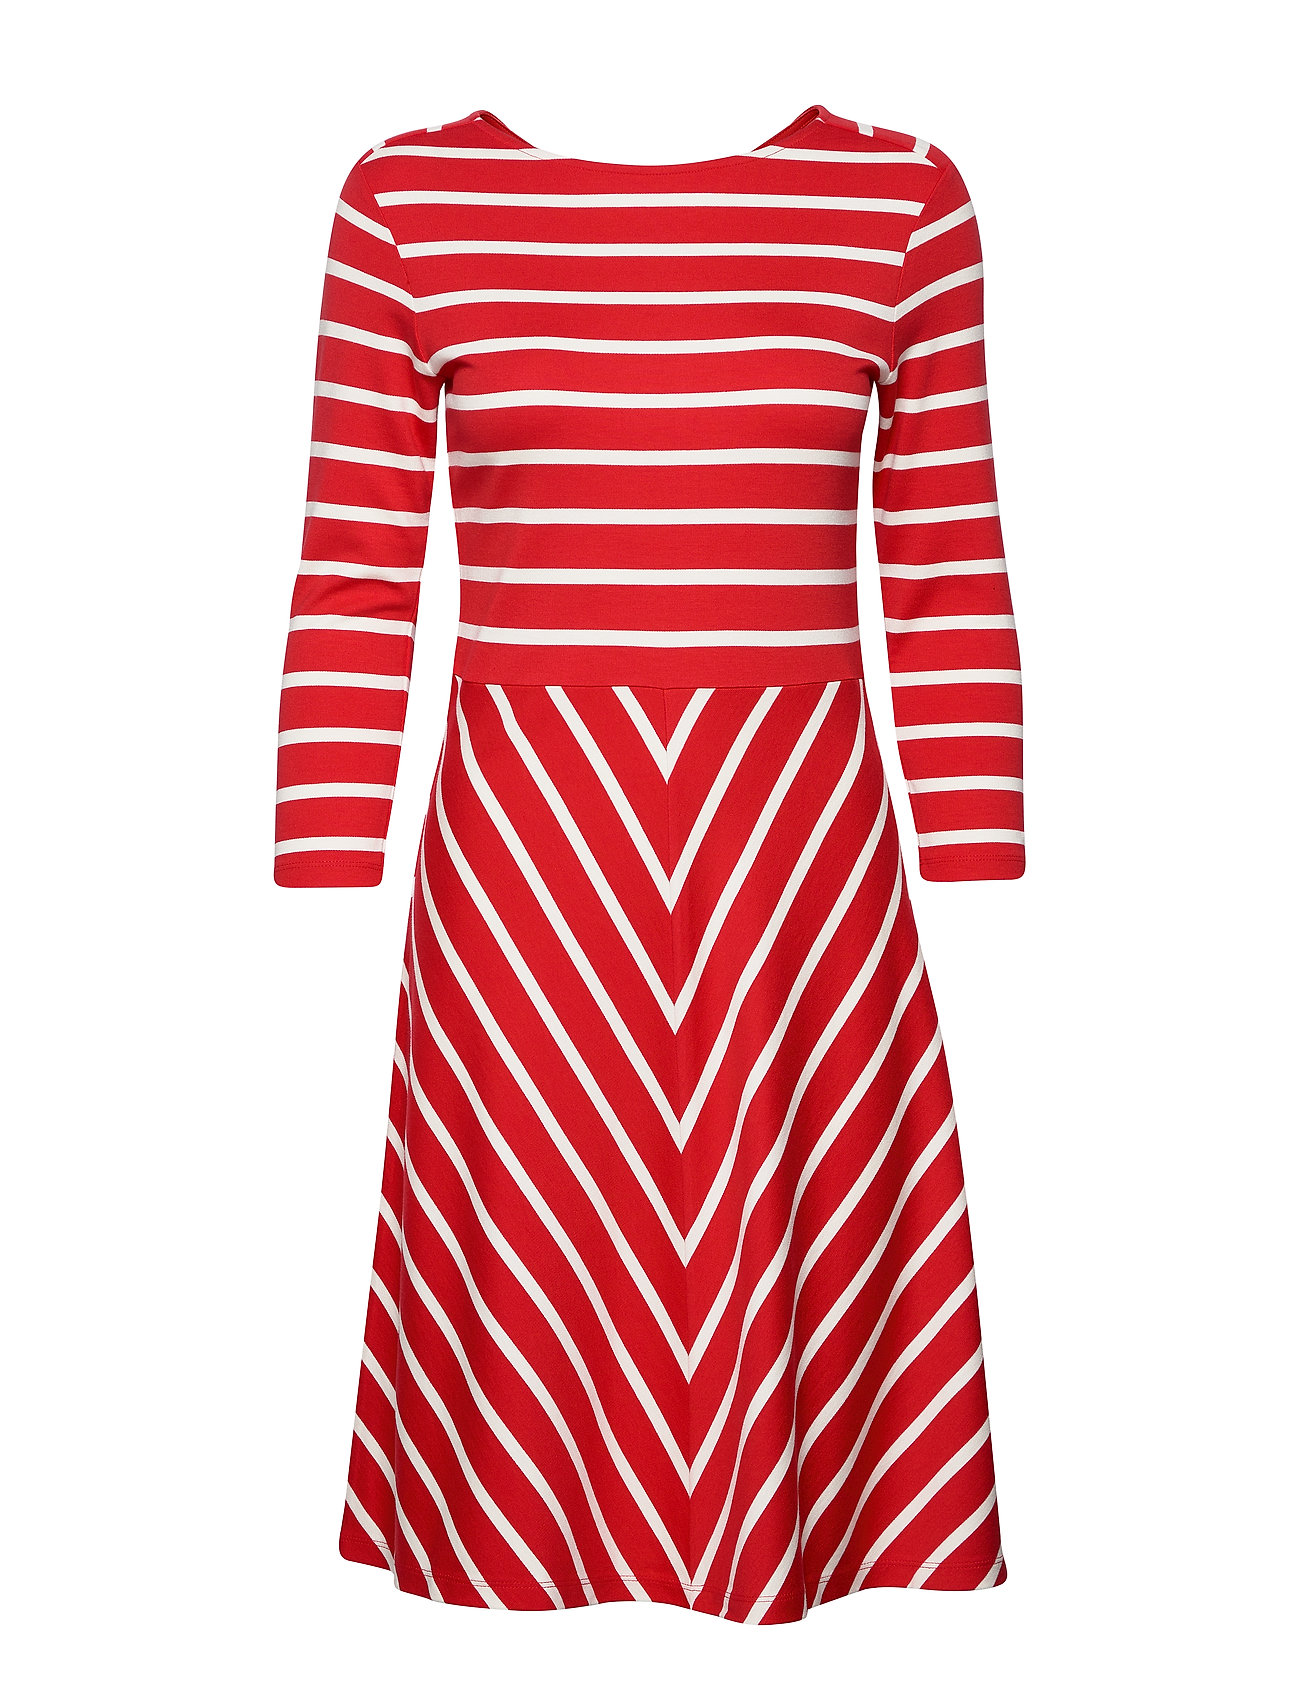 Gant D1. STRIPED DRESS - BRIGHT RED